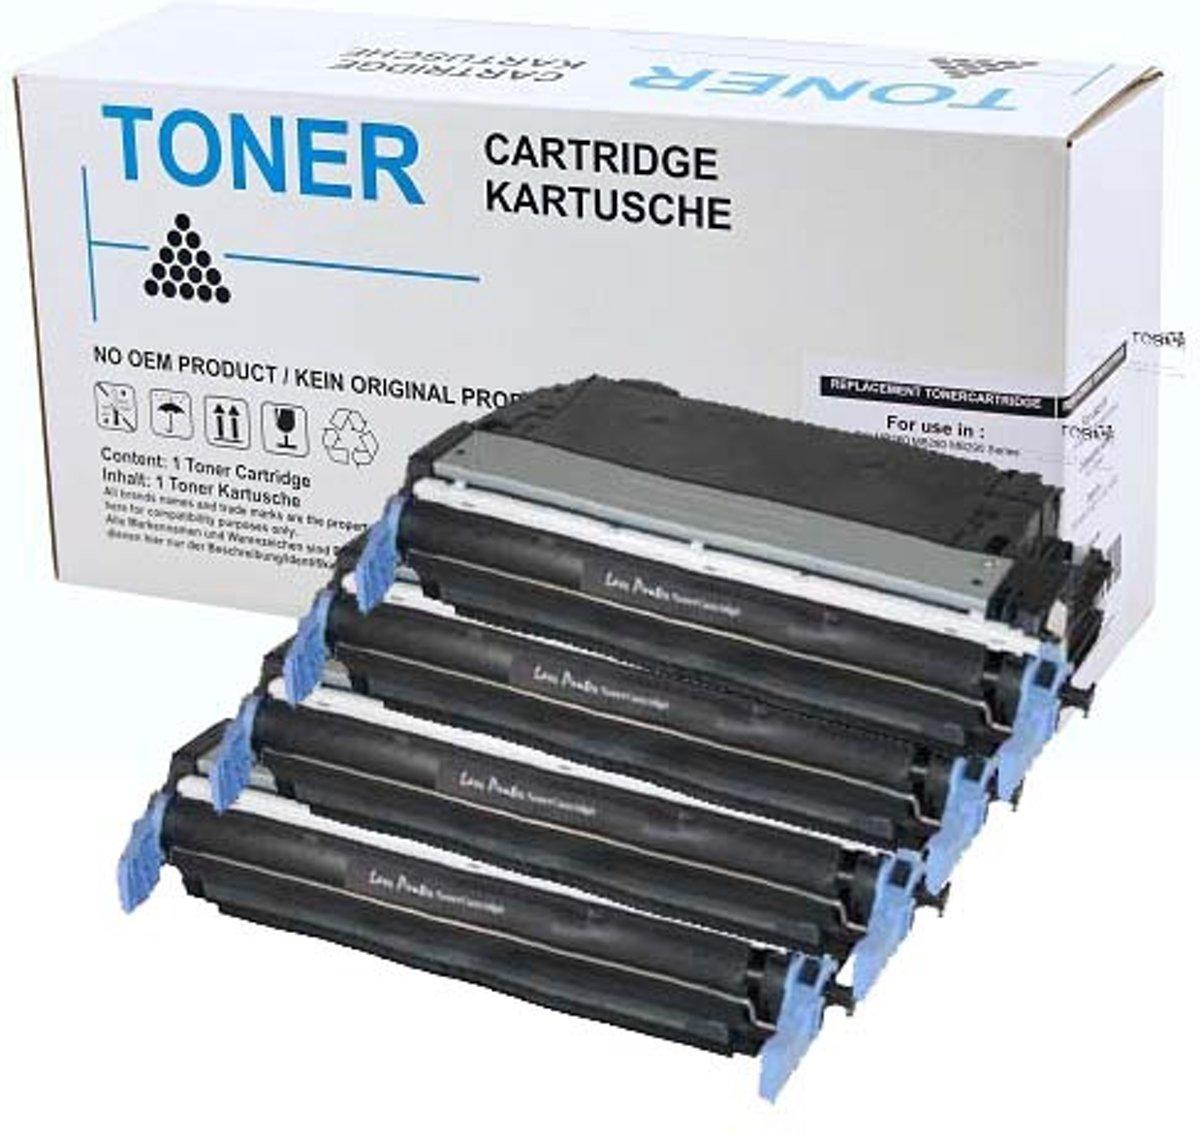 Set 4x Toner Voor Hp 641a Color Laserjet 4600 Clj 4650 Yellow Print Cartridge C9722a